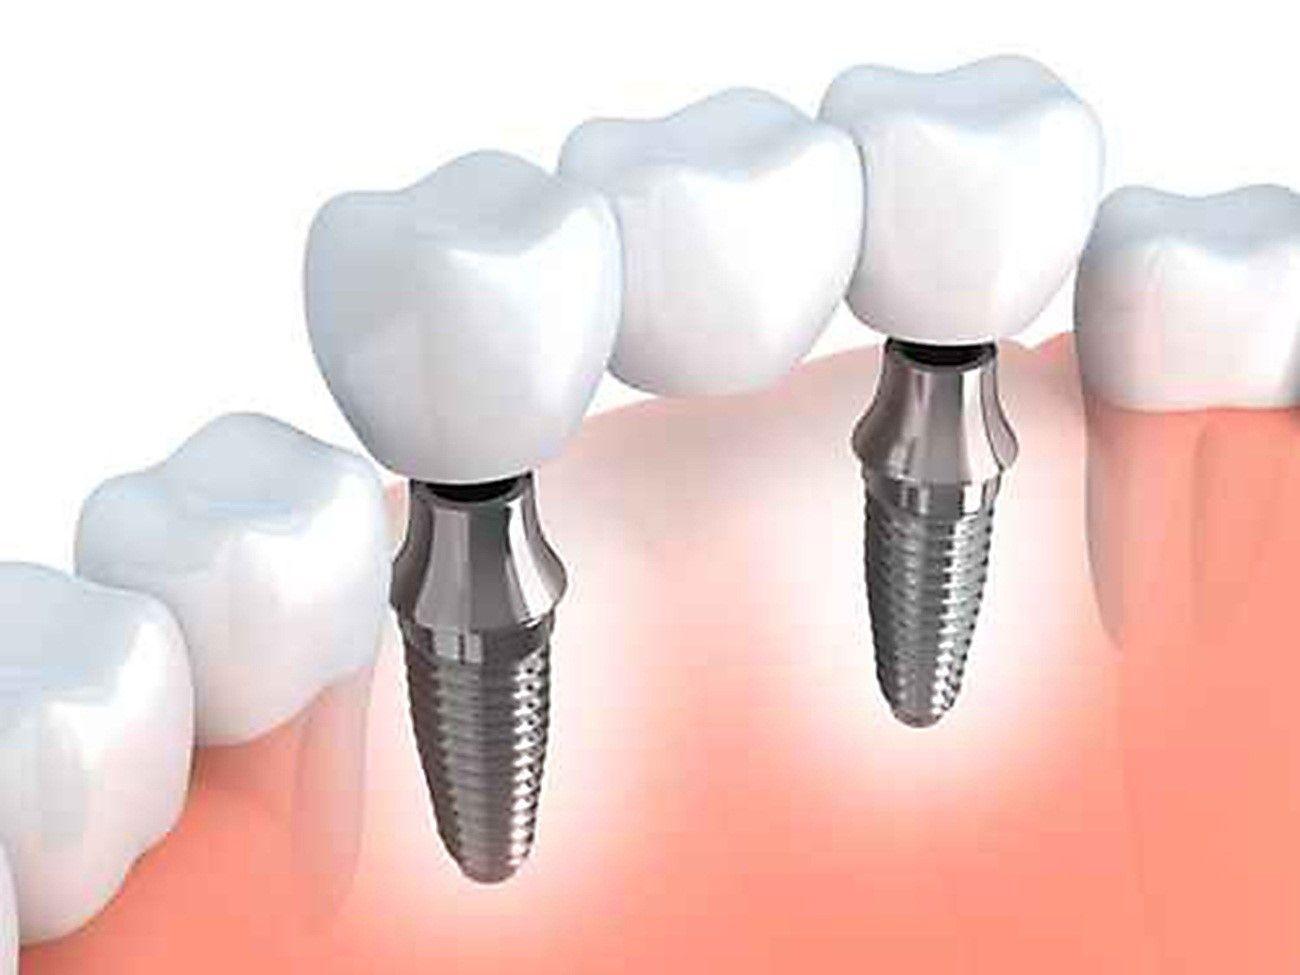 puentes sobre implantes